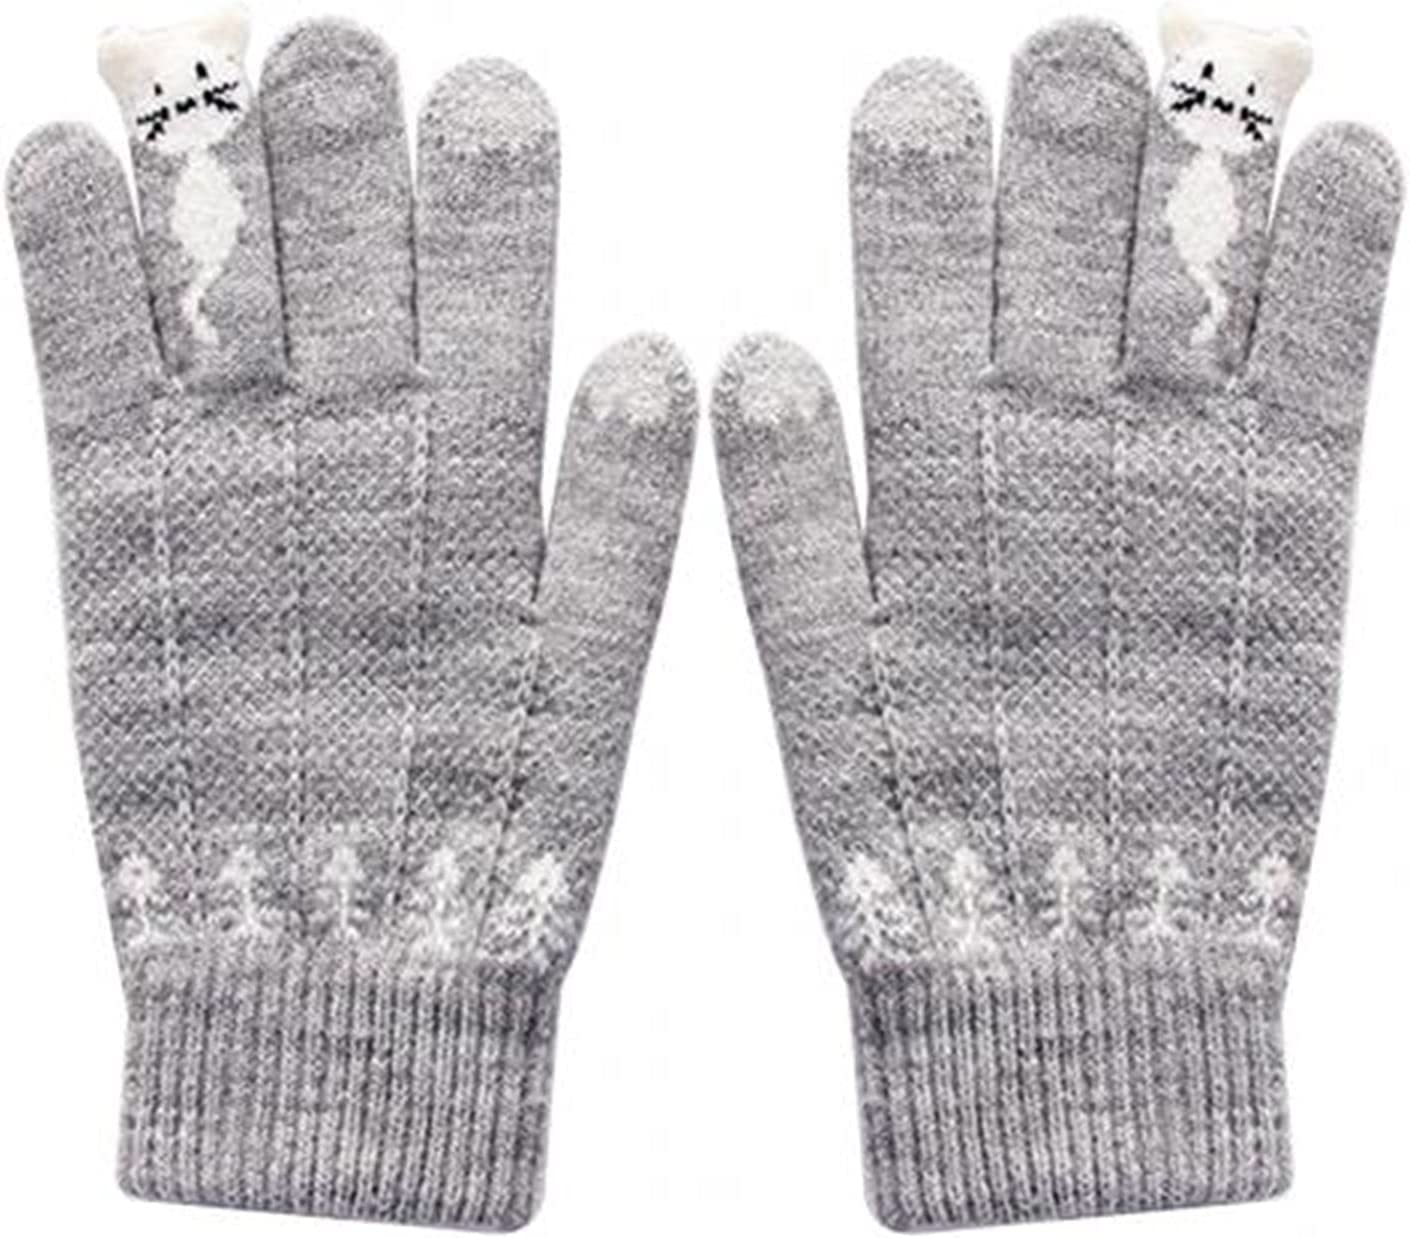 YSJJSQZ Winter Gloves Warm Winter Knitted Full Finger Gloves Mittens Women Cute Cartoon Cats Gloves Gloves (Color : Grey)